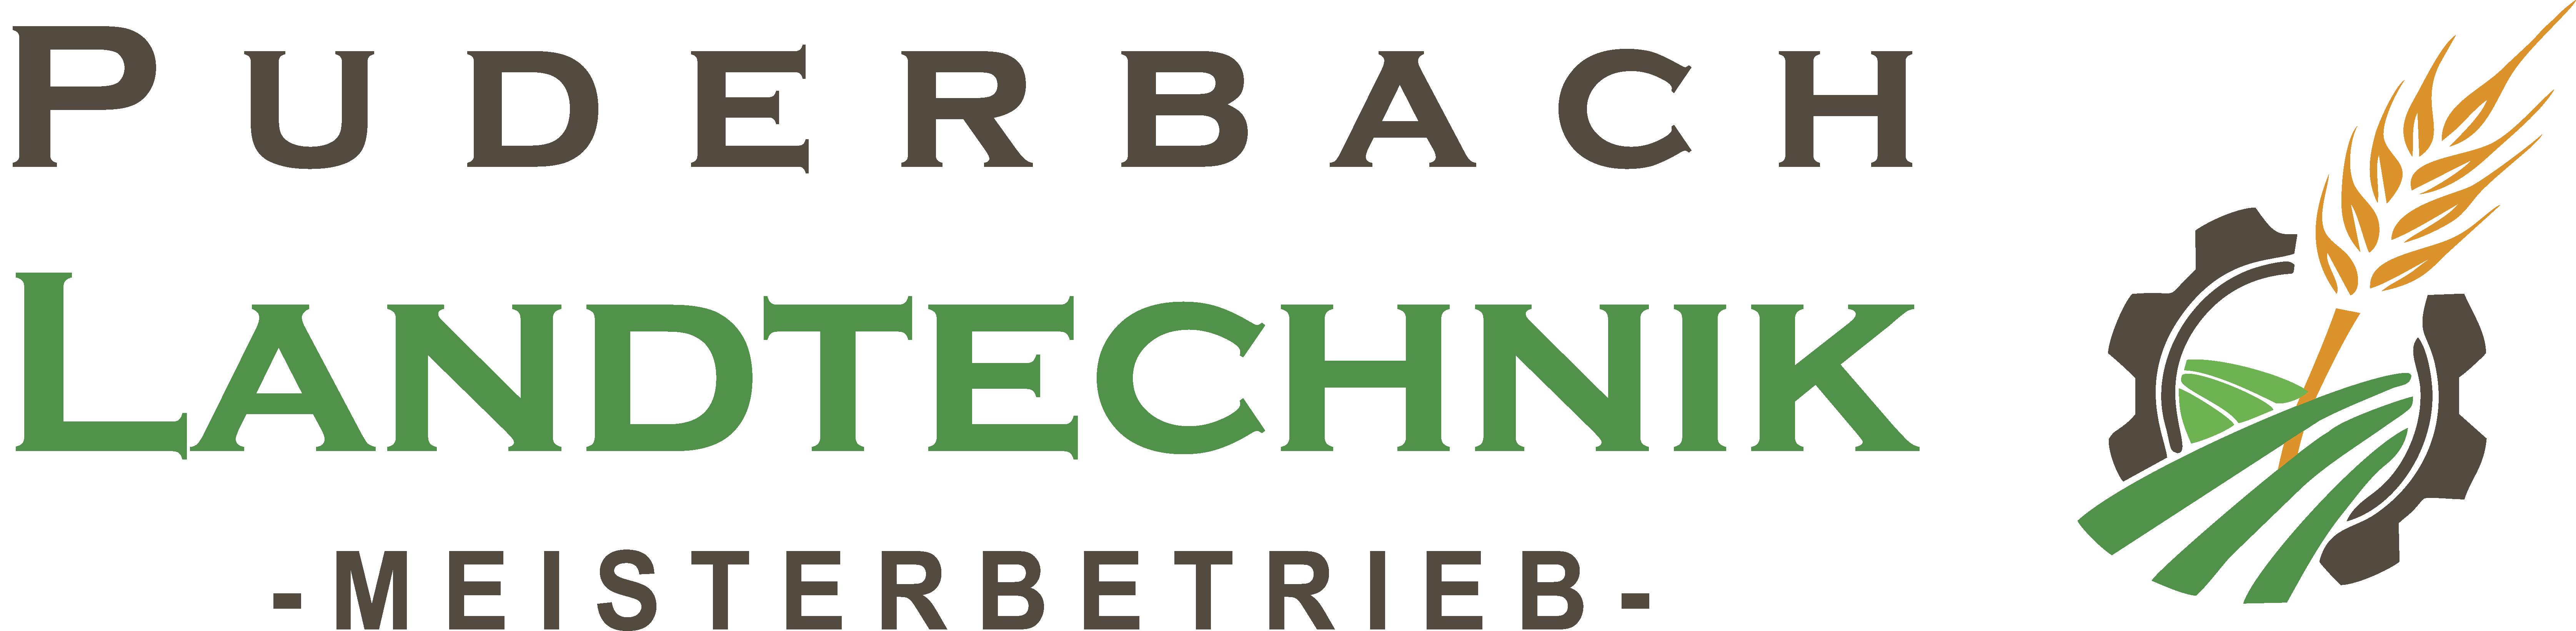 Puderbach Landtechnik